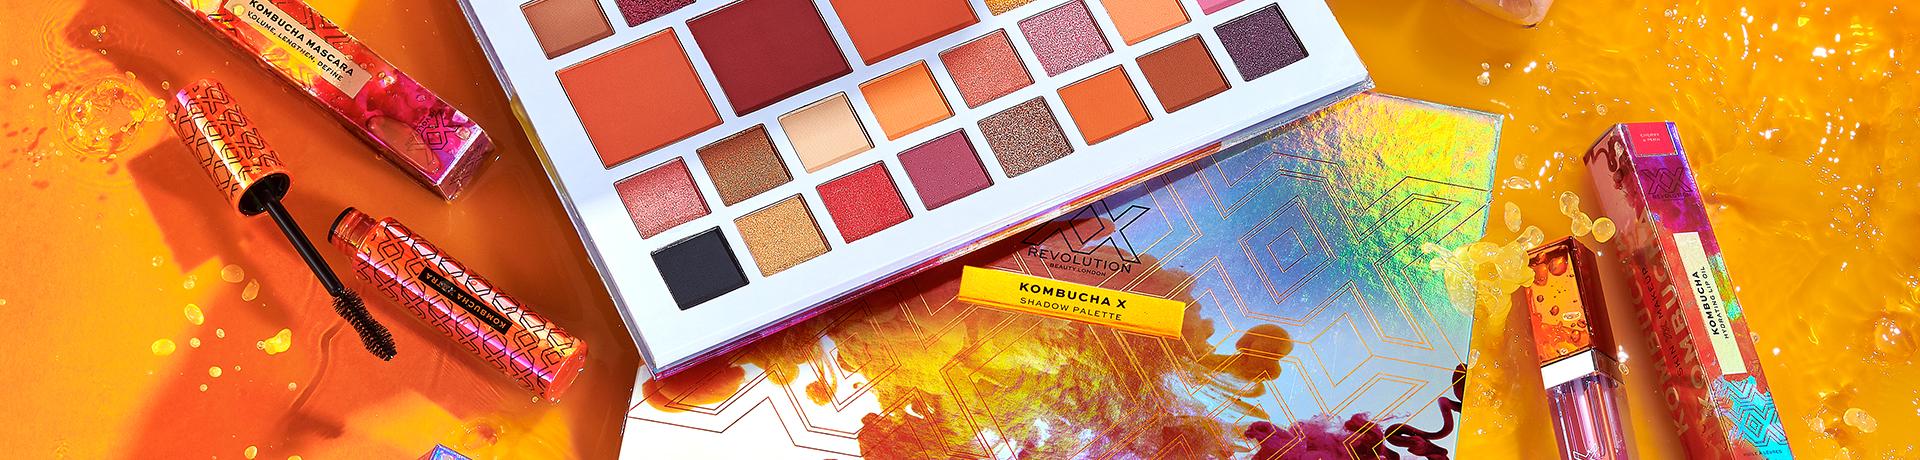 What is Kombucha In Skincare?